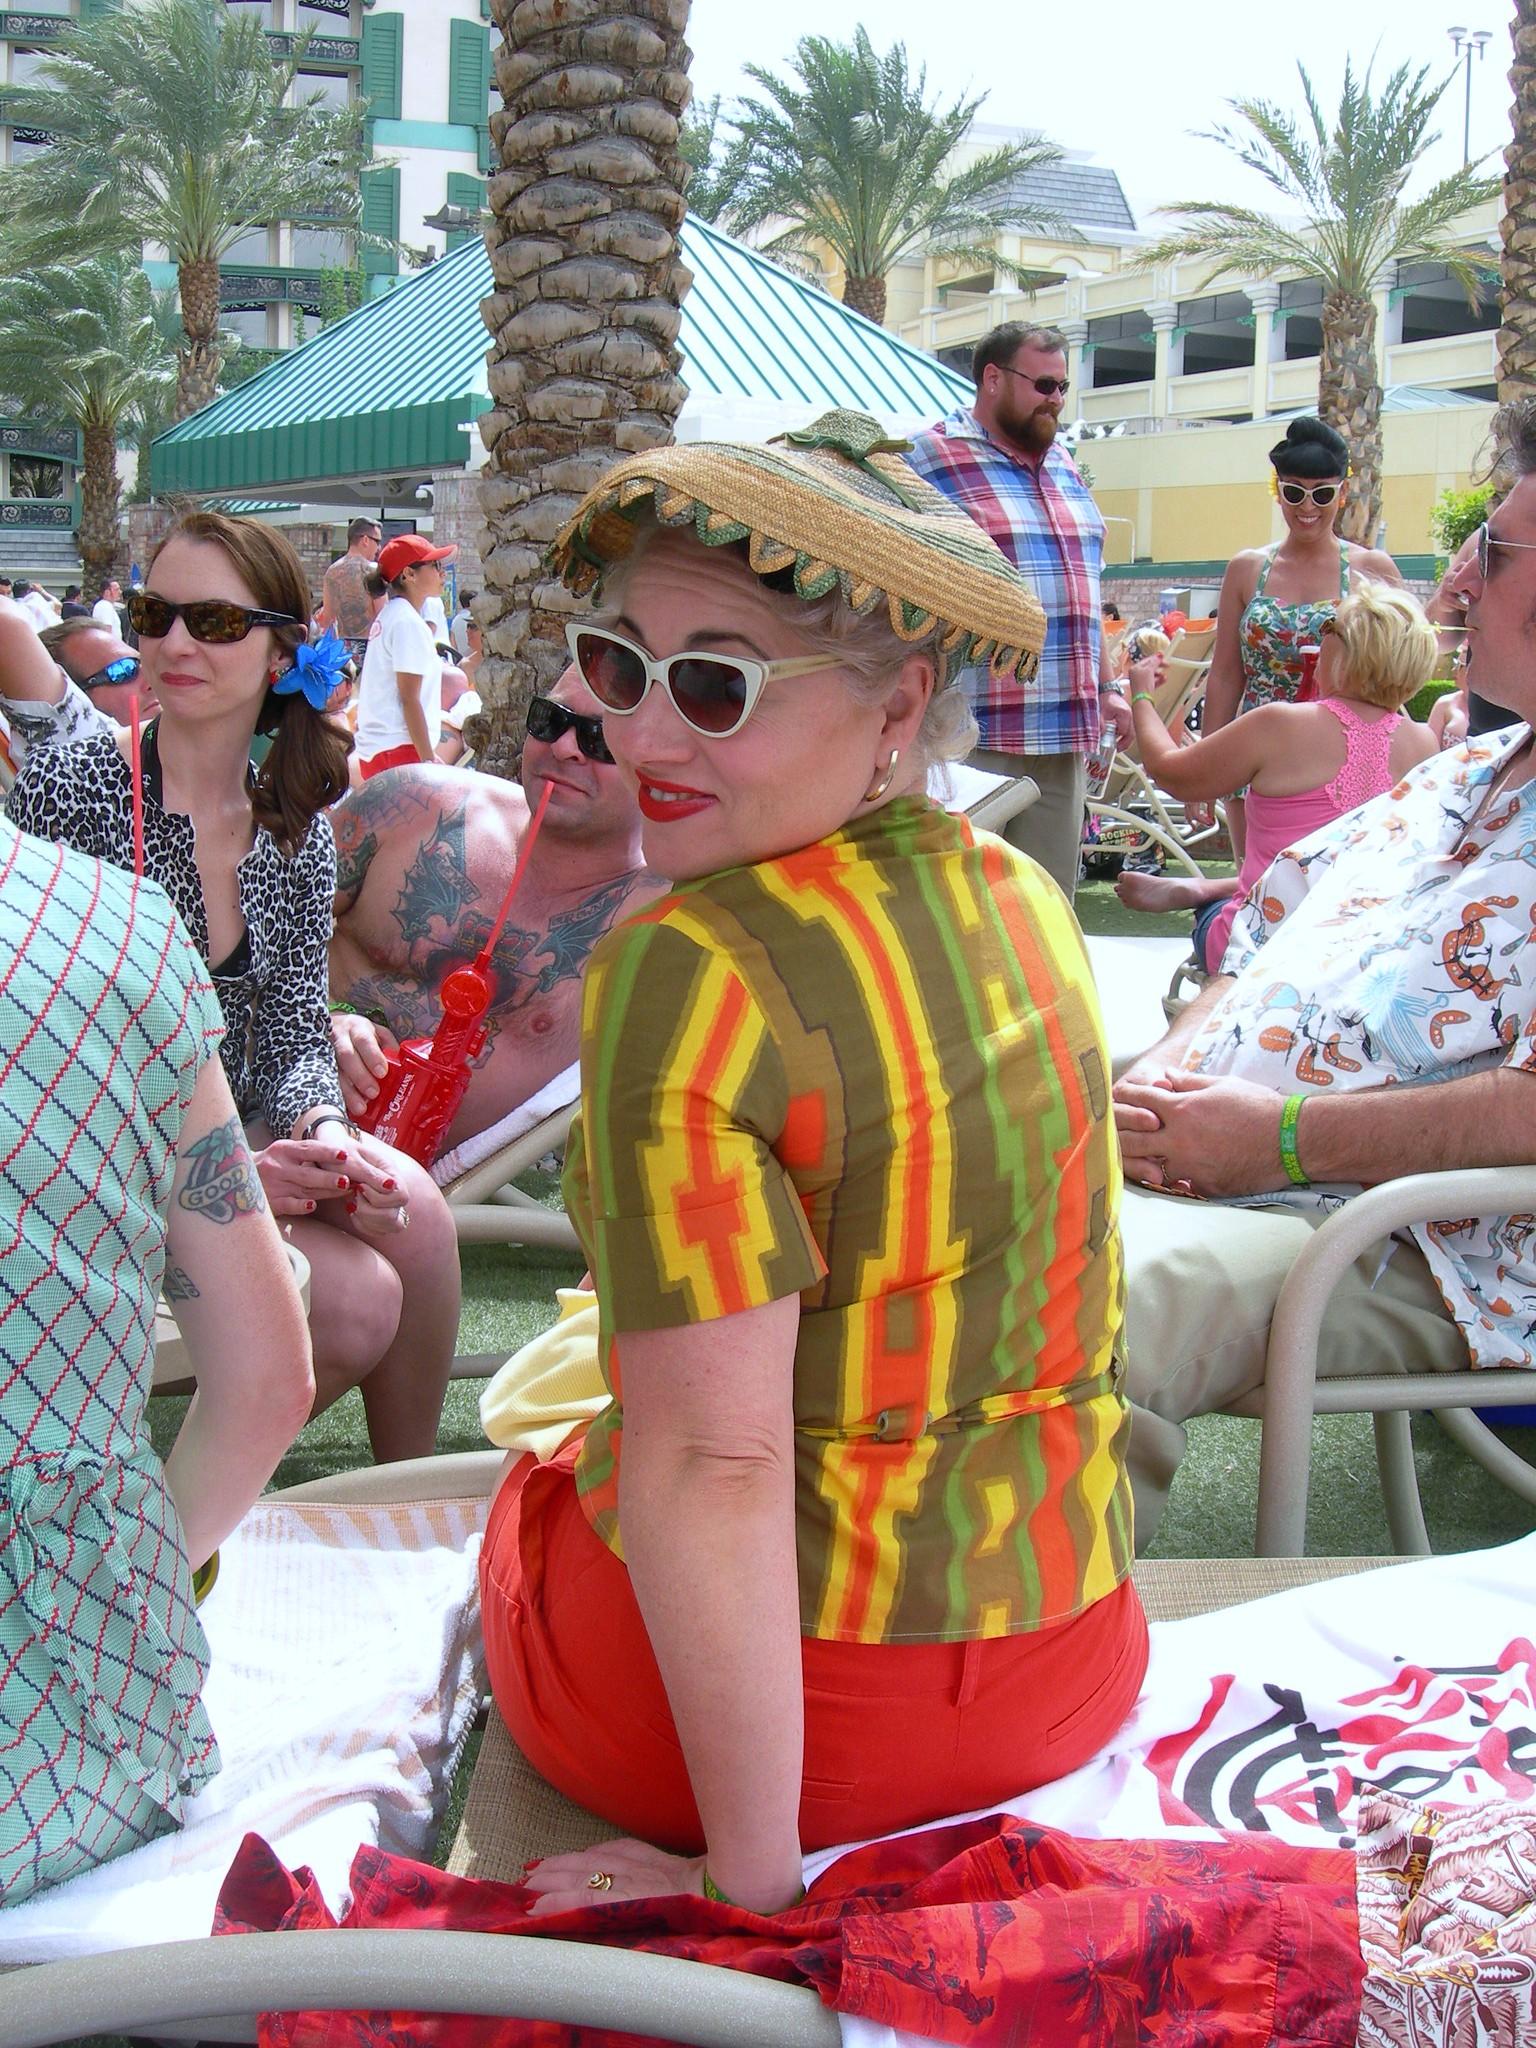 Viva las vegas 2015 087 sunday pool party the for Pool show vegas 2015